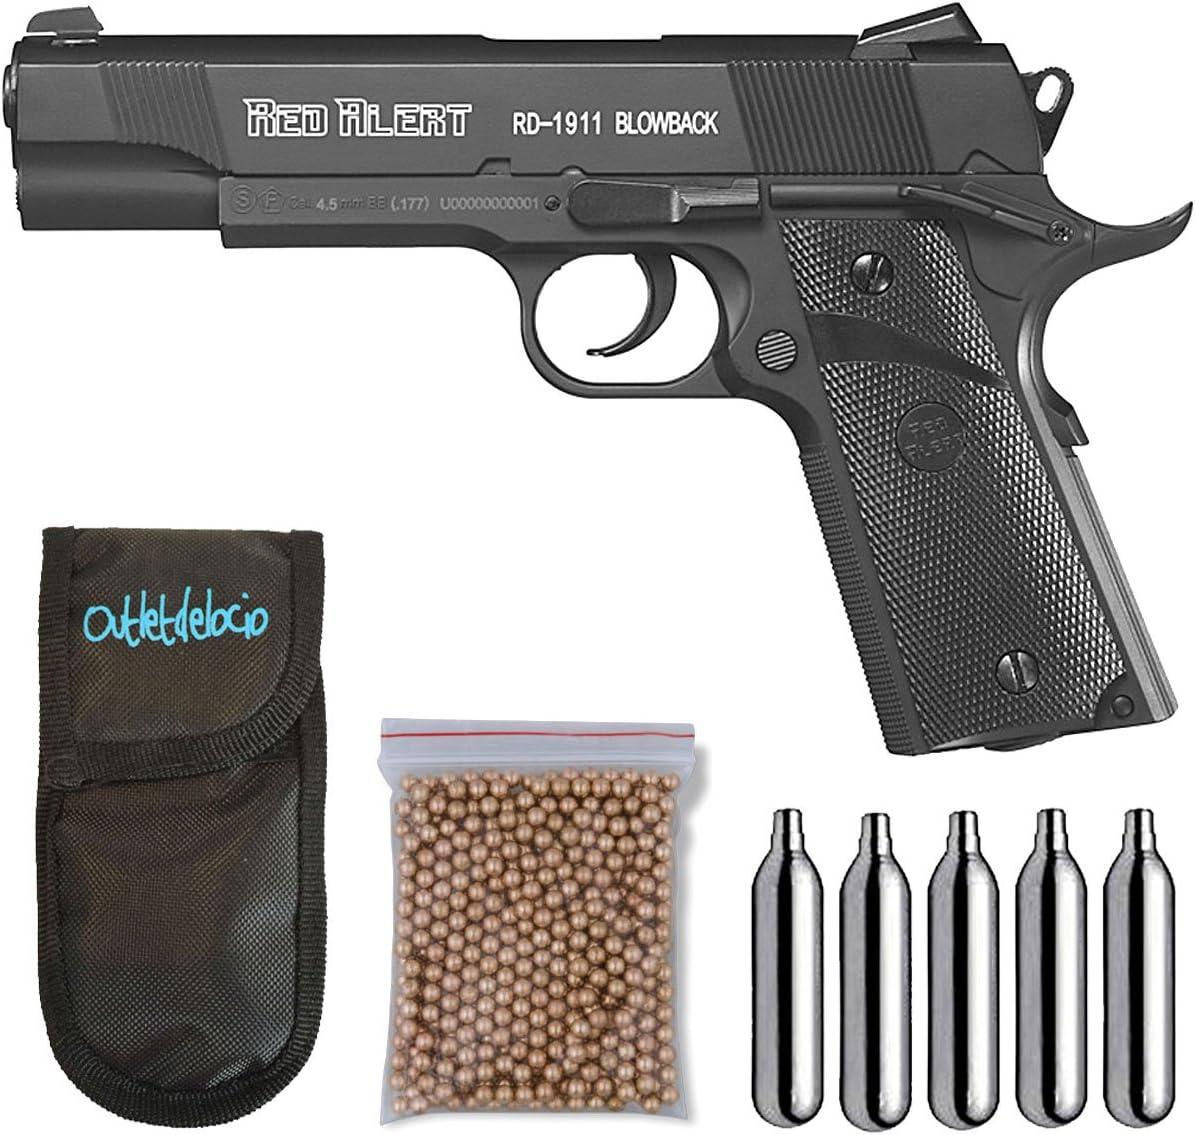 Outletdelocio, Pistola Perdigón Gamo Red Alert RD-1911 Blowback, Calibre 4,5mm BBS, Funda Portabombonas, Balines y Bombonas co2, 23054/29318/38123